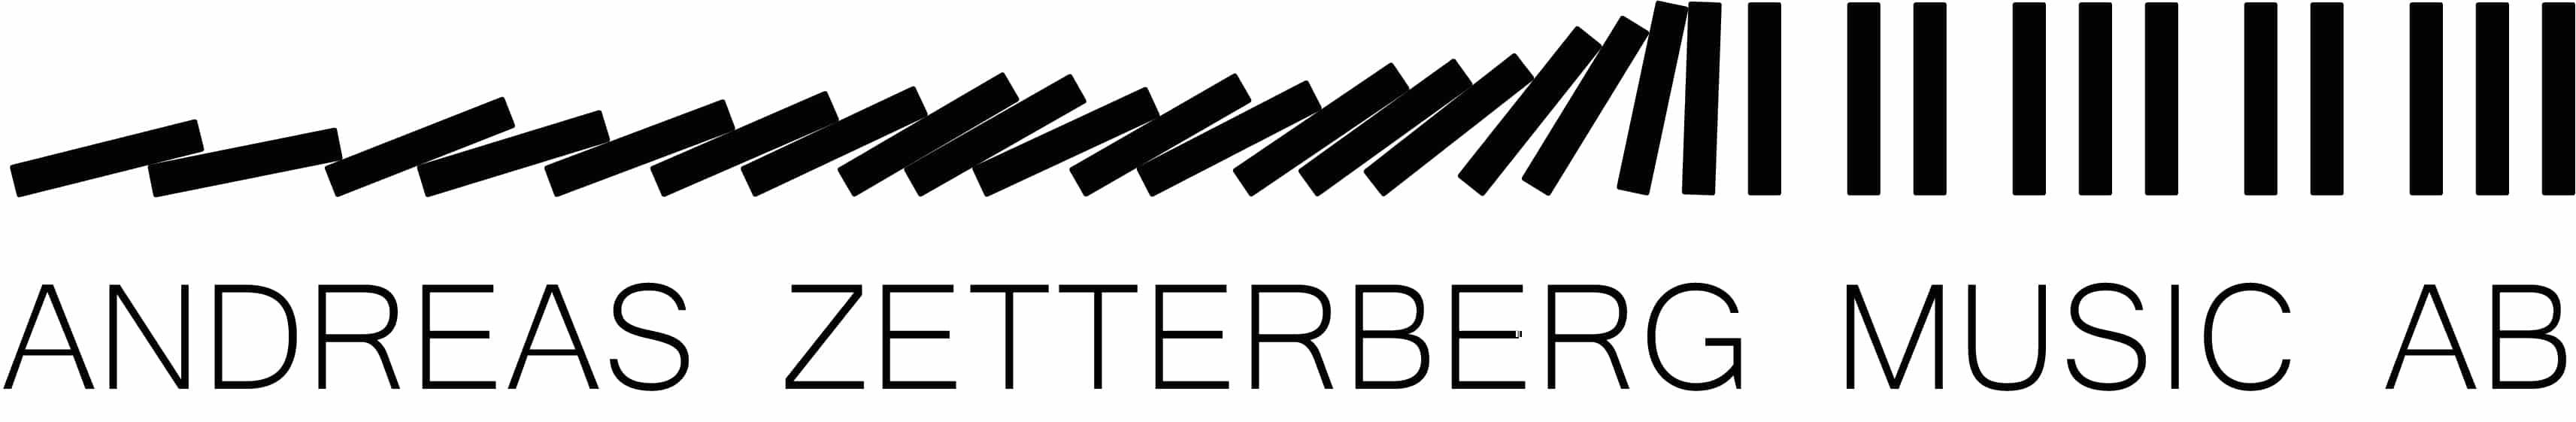 Logga Andreas Zetterberg Music AB